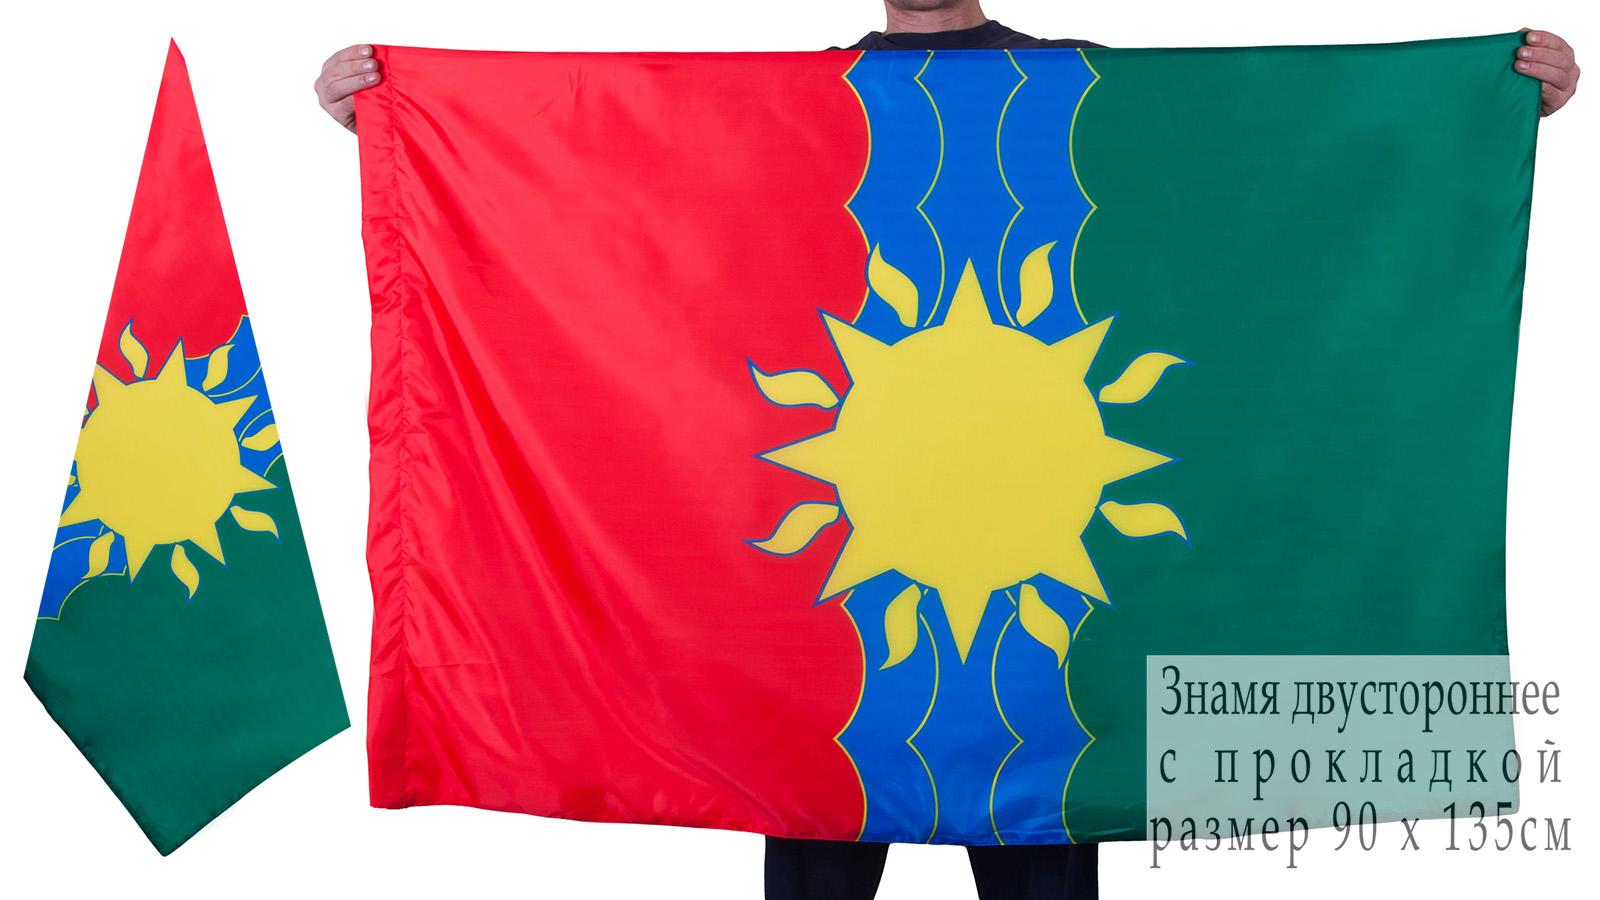 Двухсторонний флаг Братска